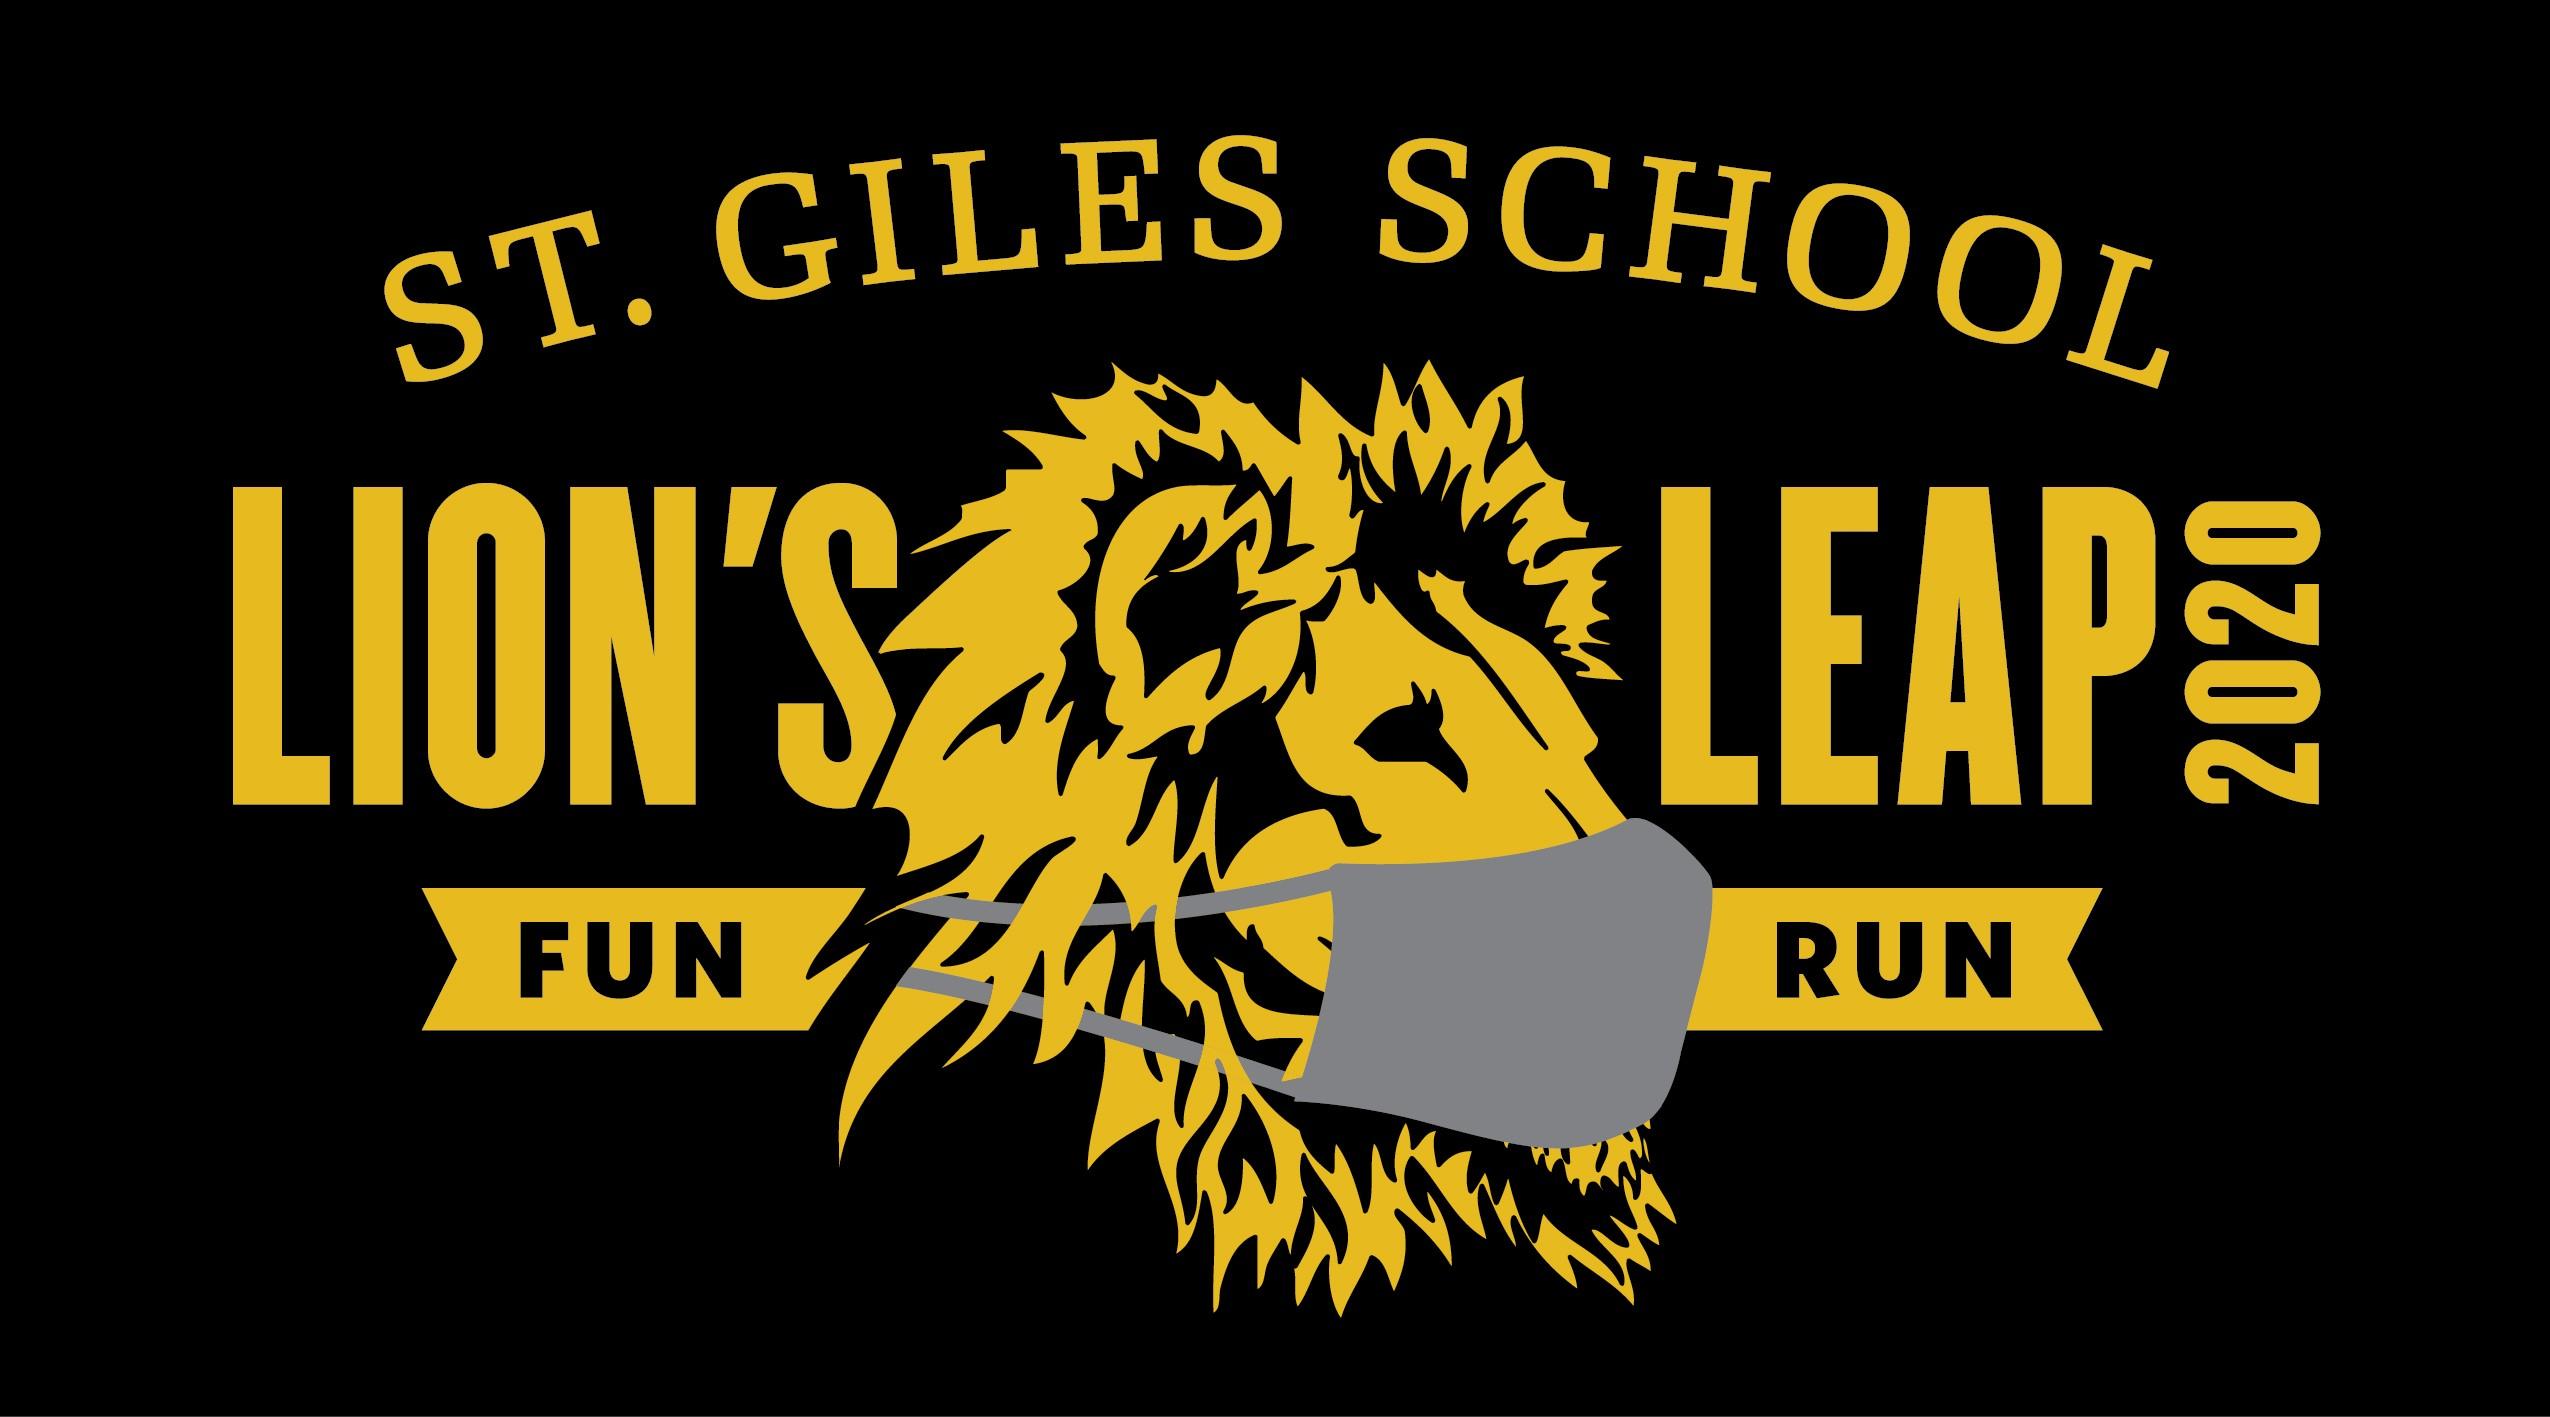 sgs_lions-leap-2020 logo